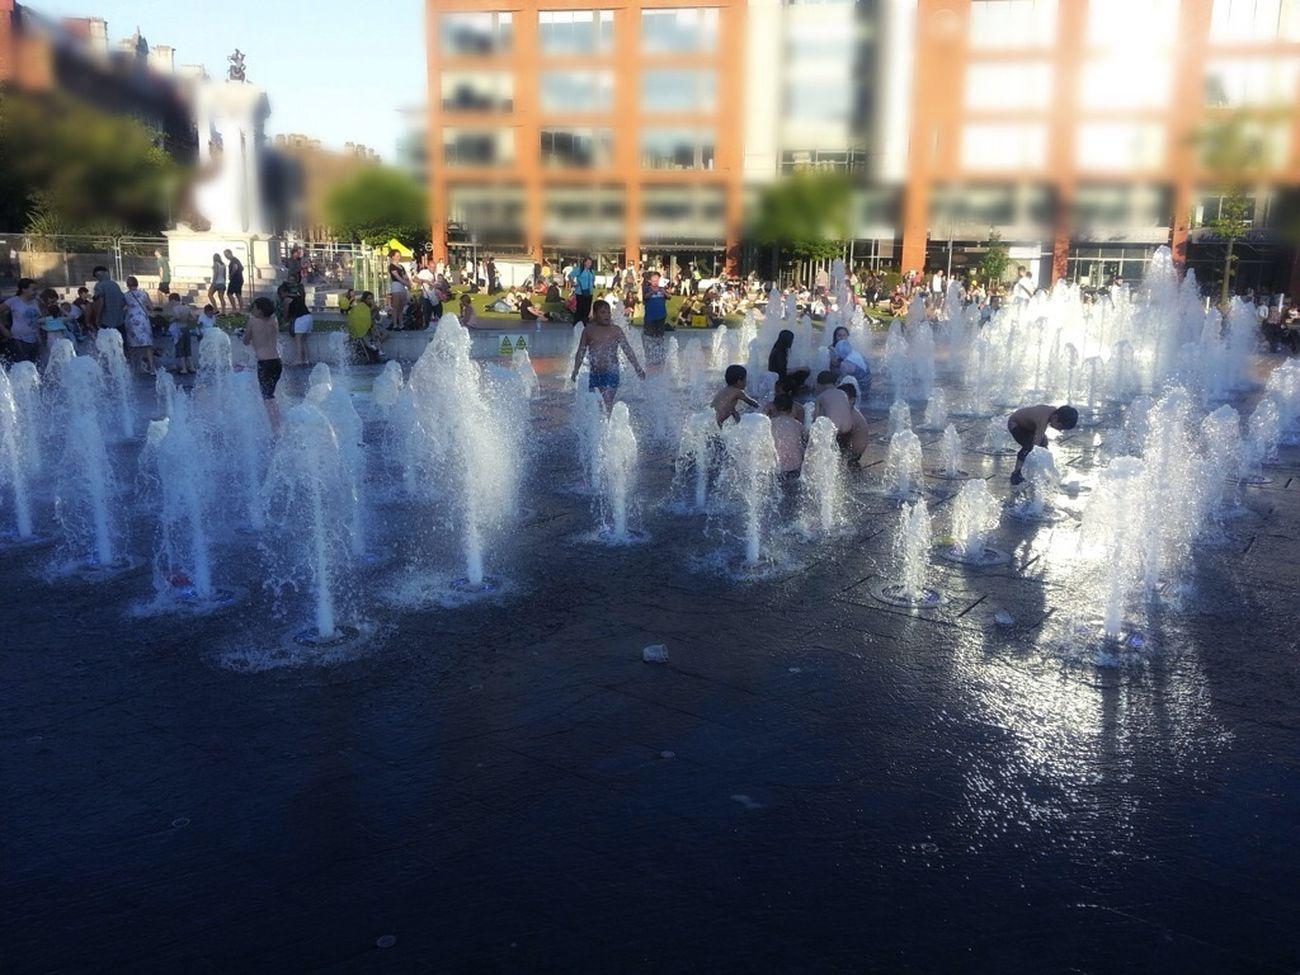 Fountian Summertime Manchester UK PeopleHavingFun No Trolls Allowed Summergefühle